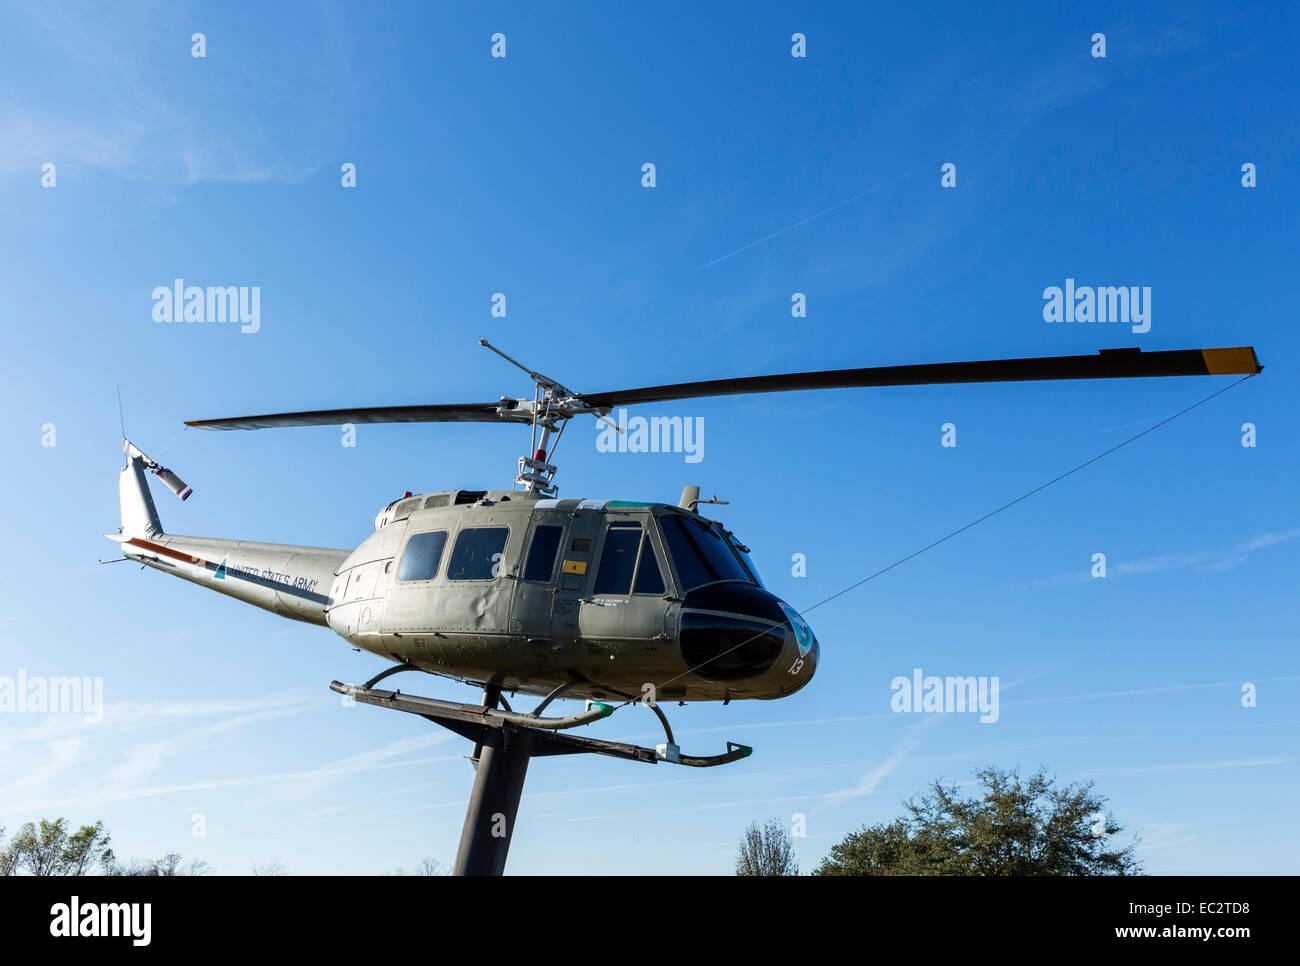 A Bell UH-1H 'Huey' helicopter at the USS Alabama Battleship Memorial Park, Mobile, Alabama, USA - Stock Image